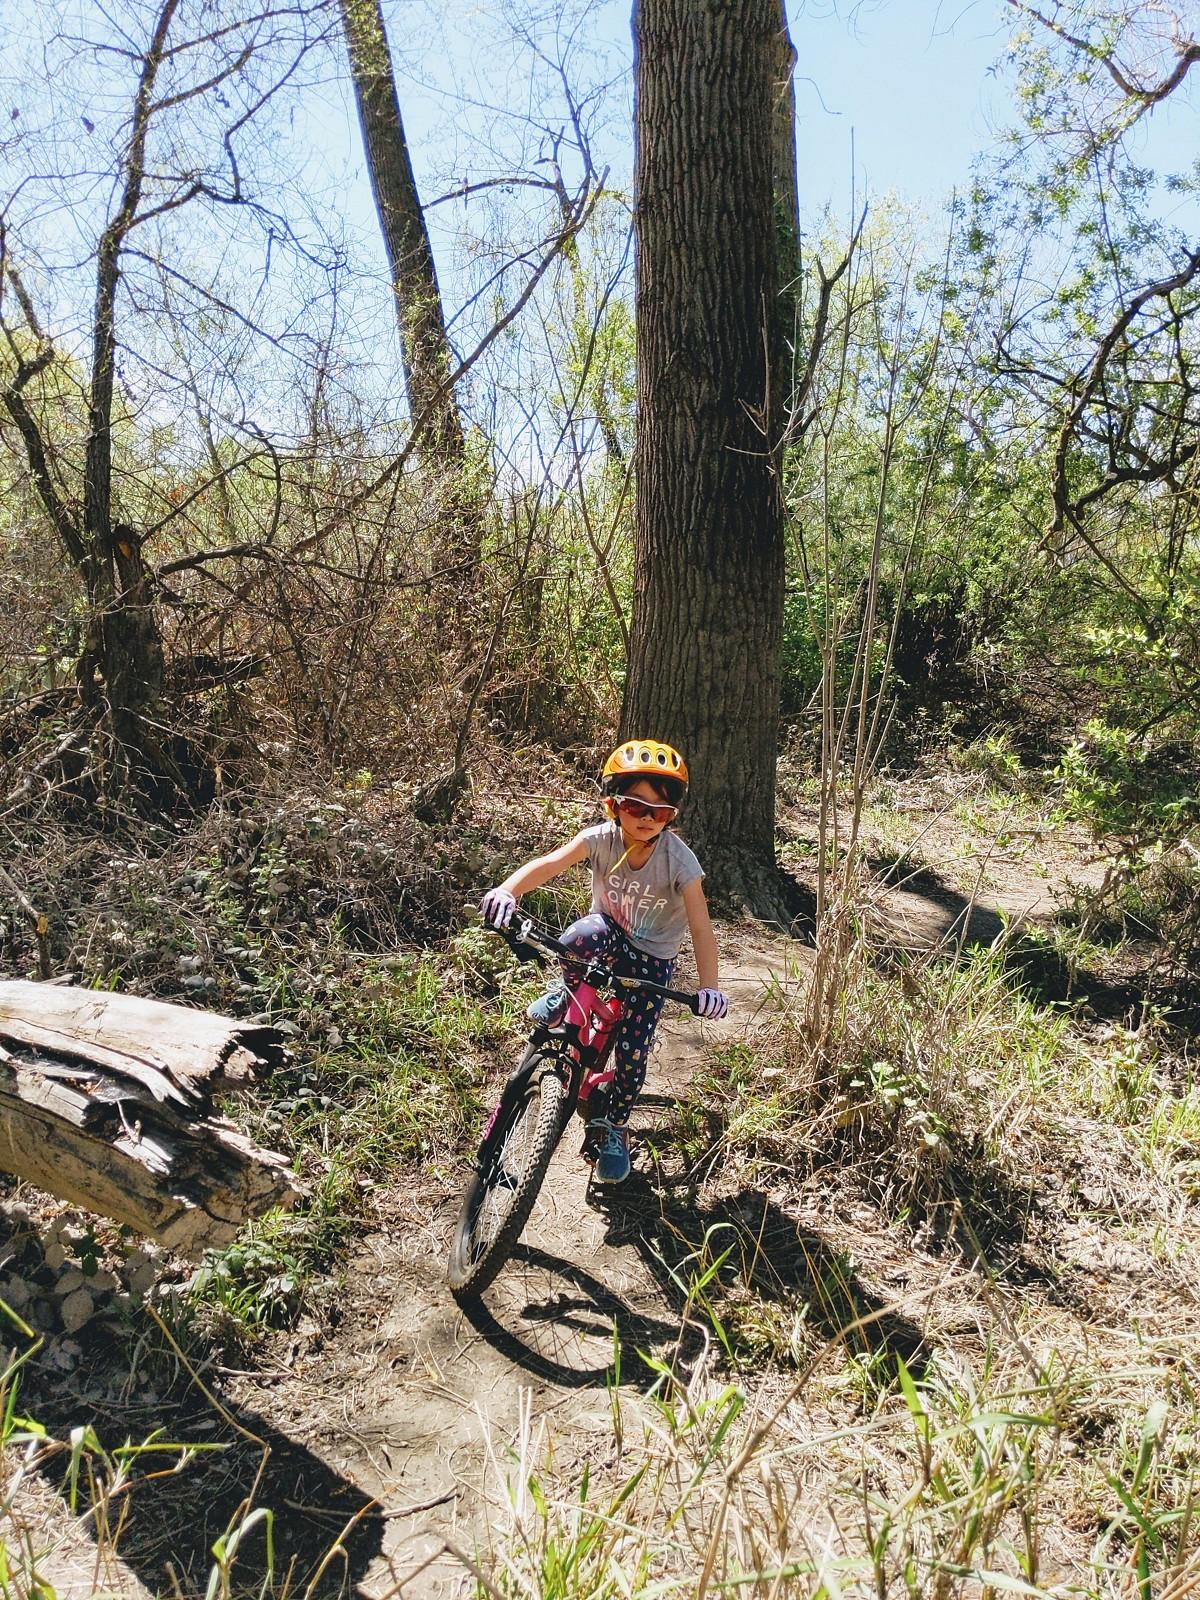 She rides like a girl - coyoterun - Mountain Biking Pictures - Vital MTB